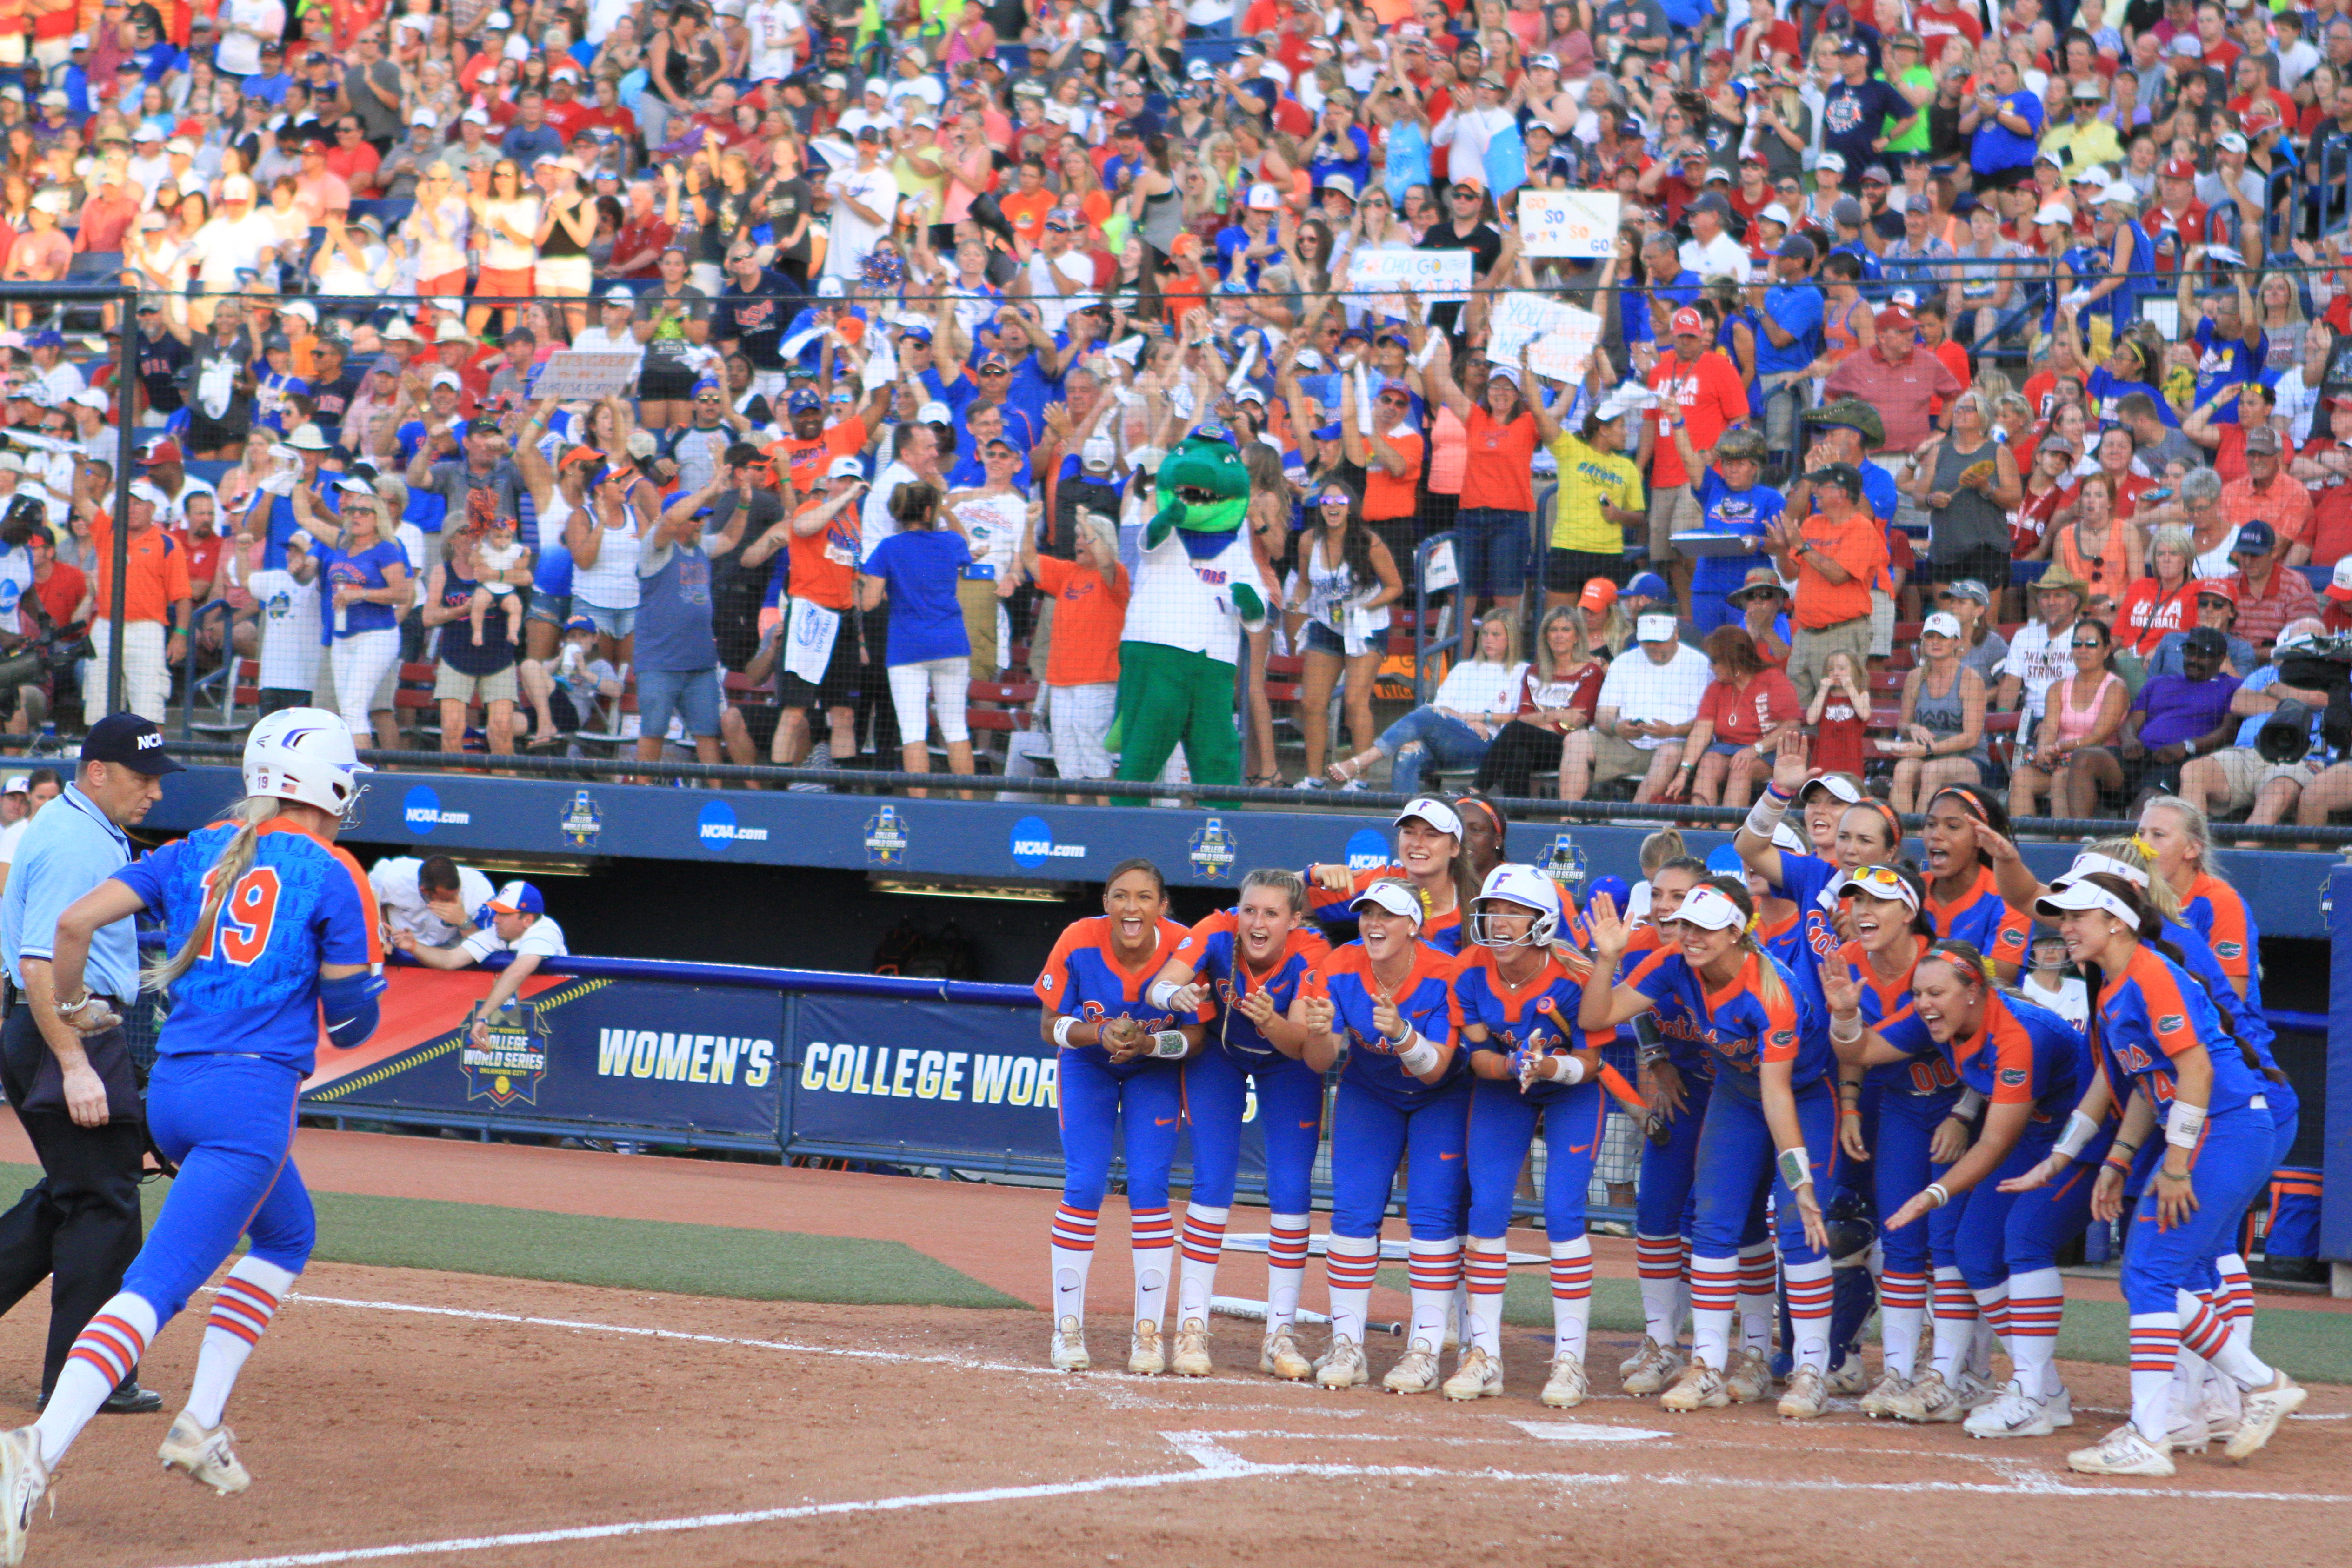 2017 NCAA Division I Women's Softball Championship - Game 2